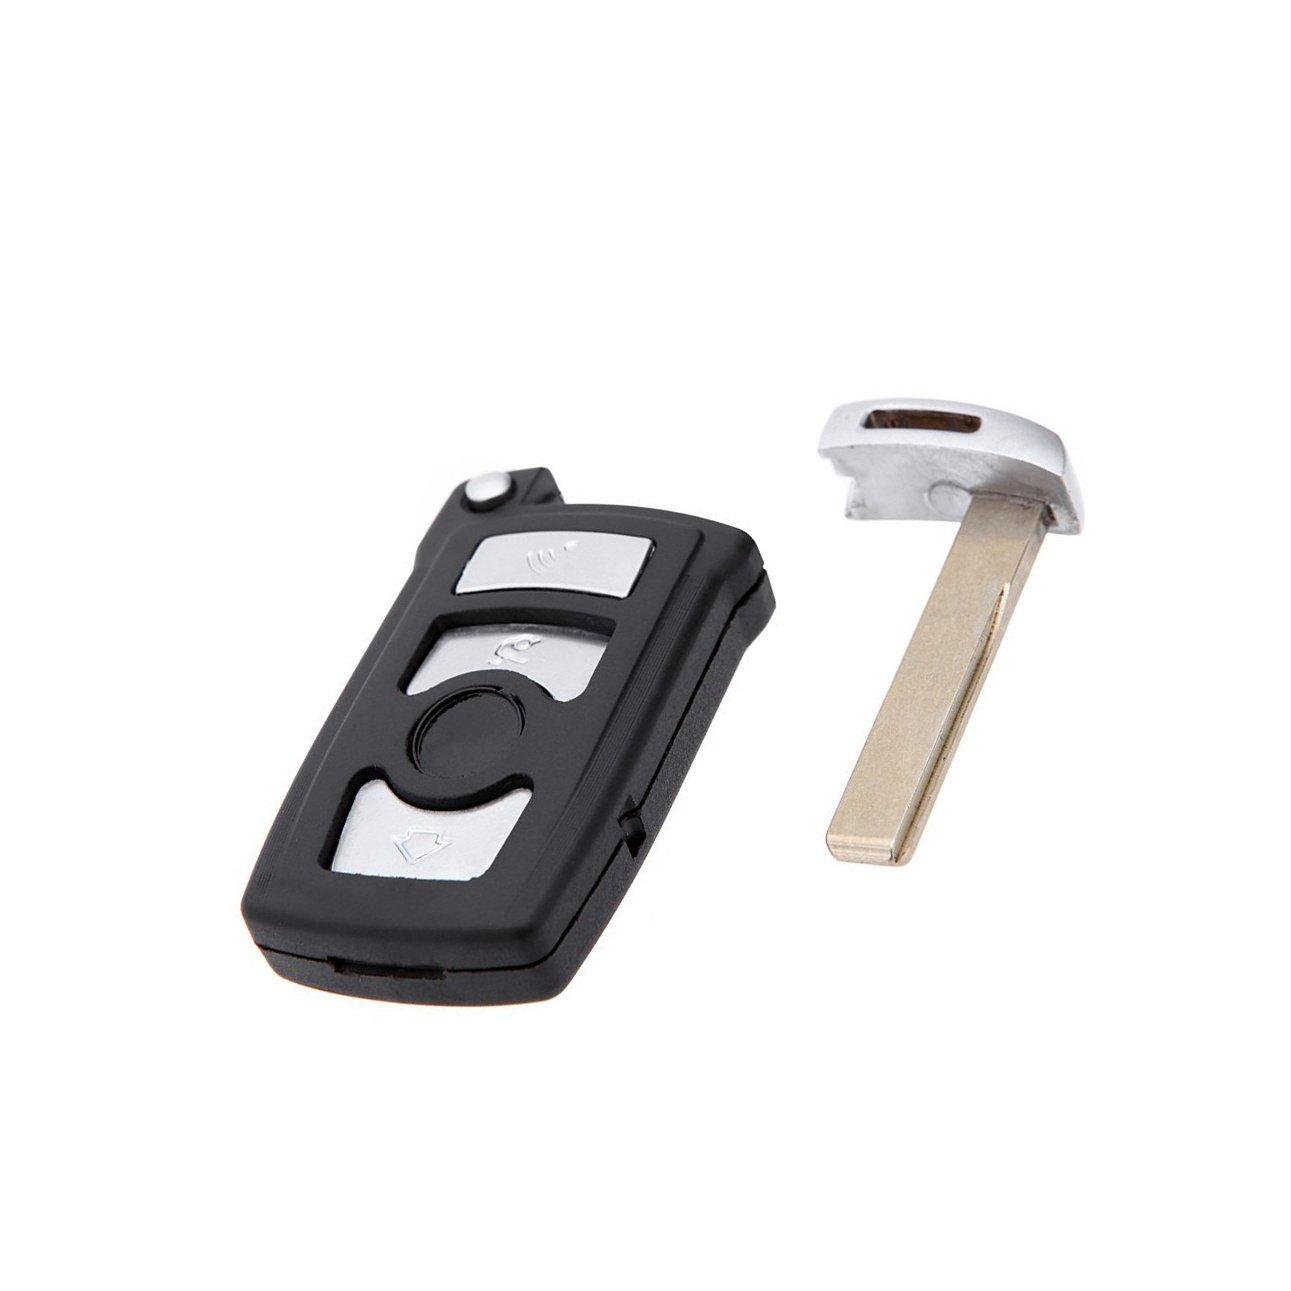 Replacement Uncut 4 Buttons Smart Key Shell Case Fob for BMW 745i 745Li 750i 750Li xDrive 760i 760Li 650i No Chip